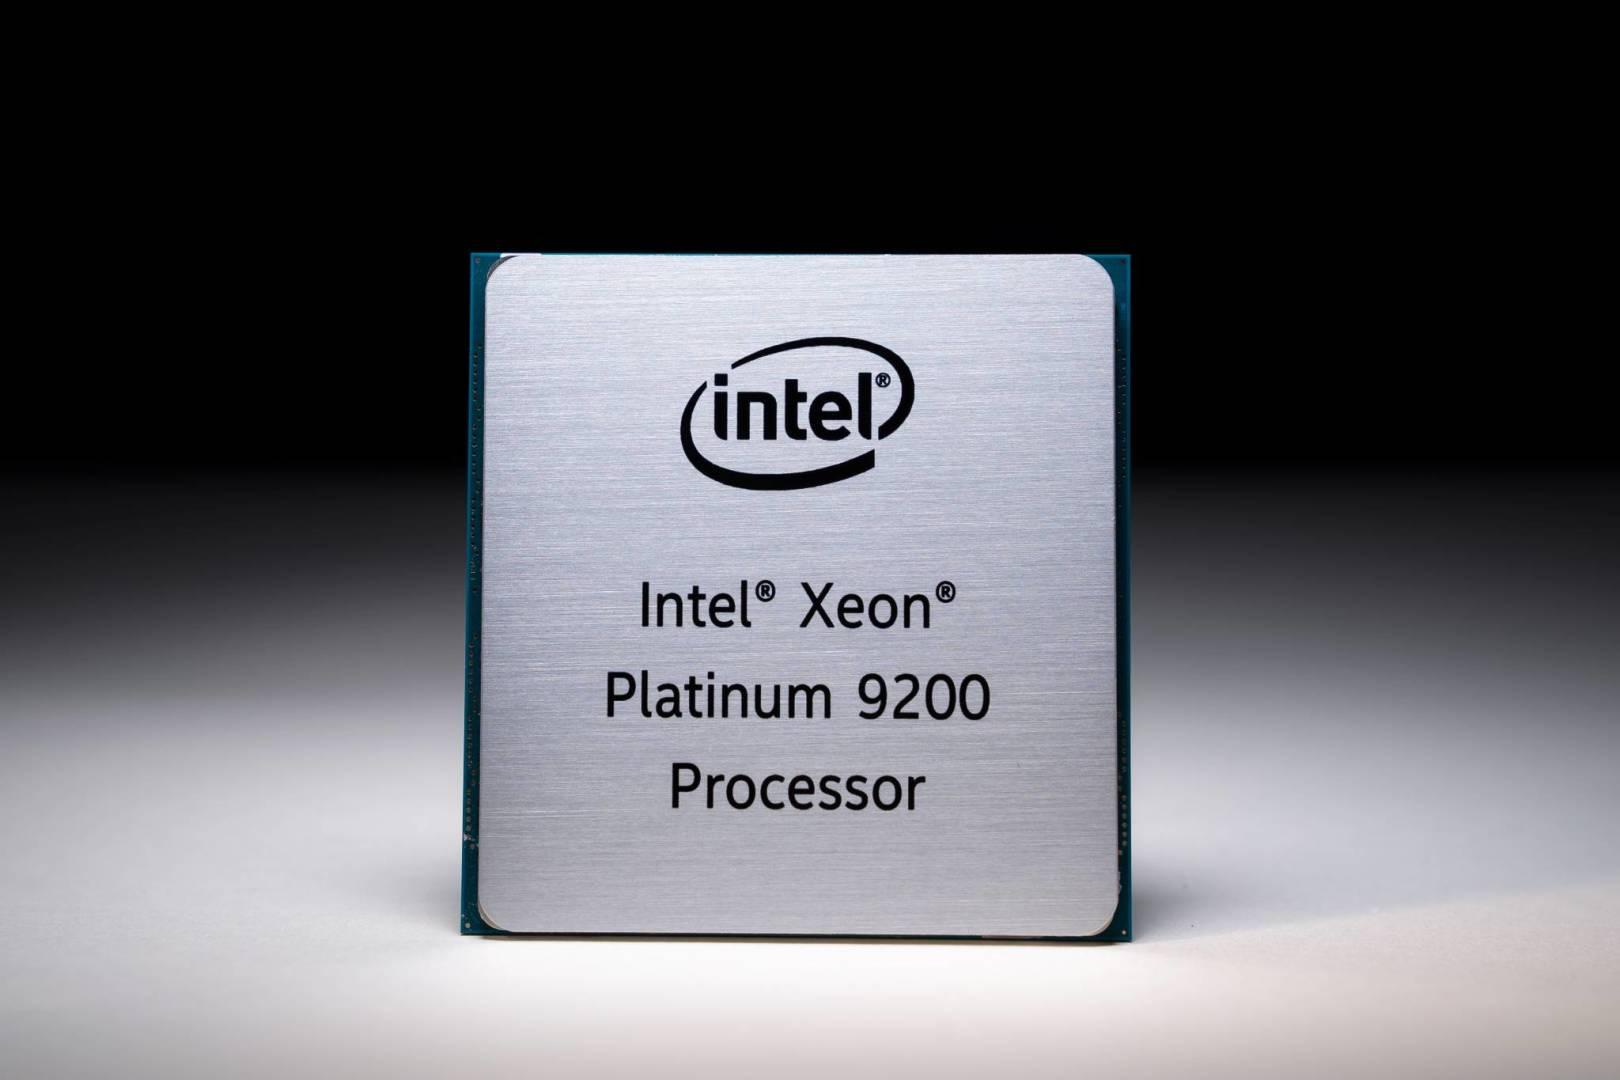 Intel Xeon Platinum 9200